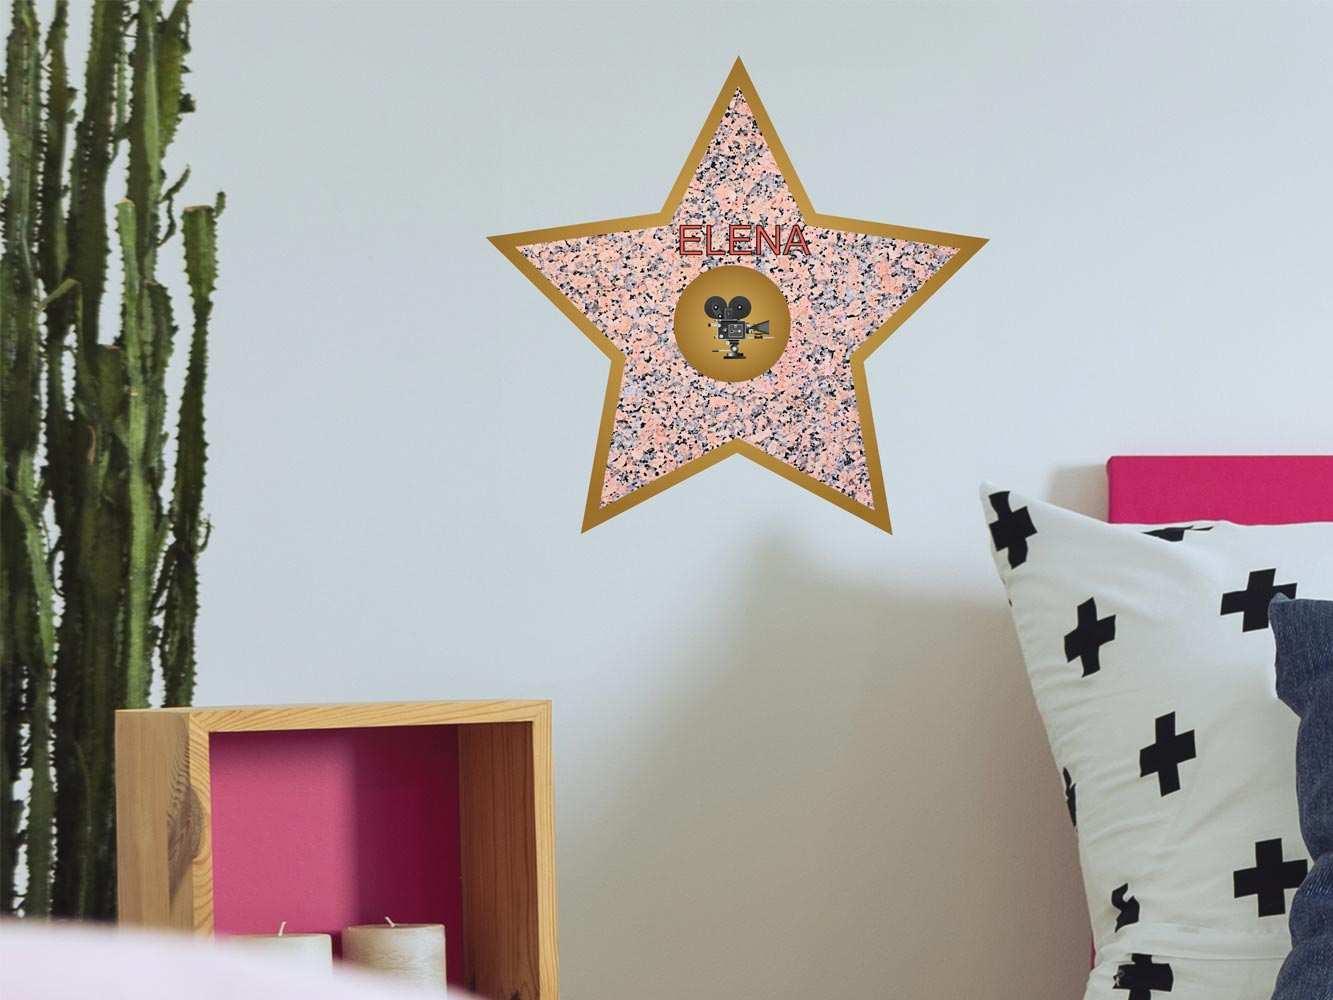 Vinilo Infantil Estrella Cine Personalizado | Carteles XXL - Impresión carteleria publicitaria